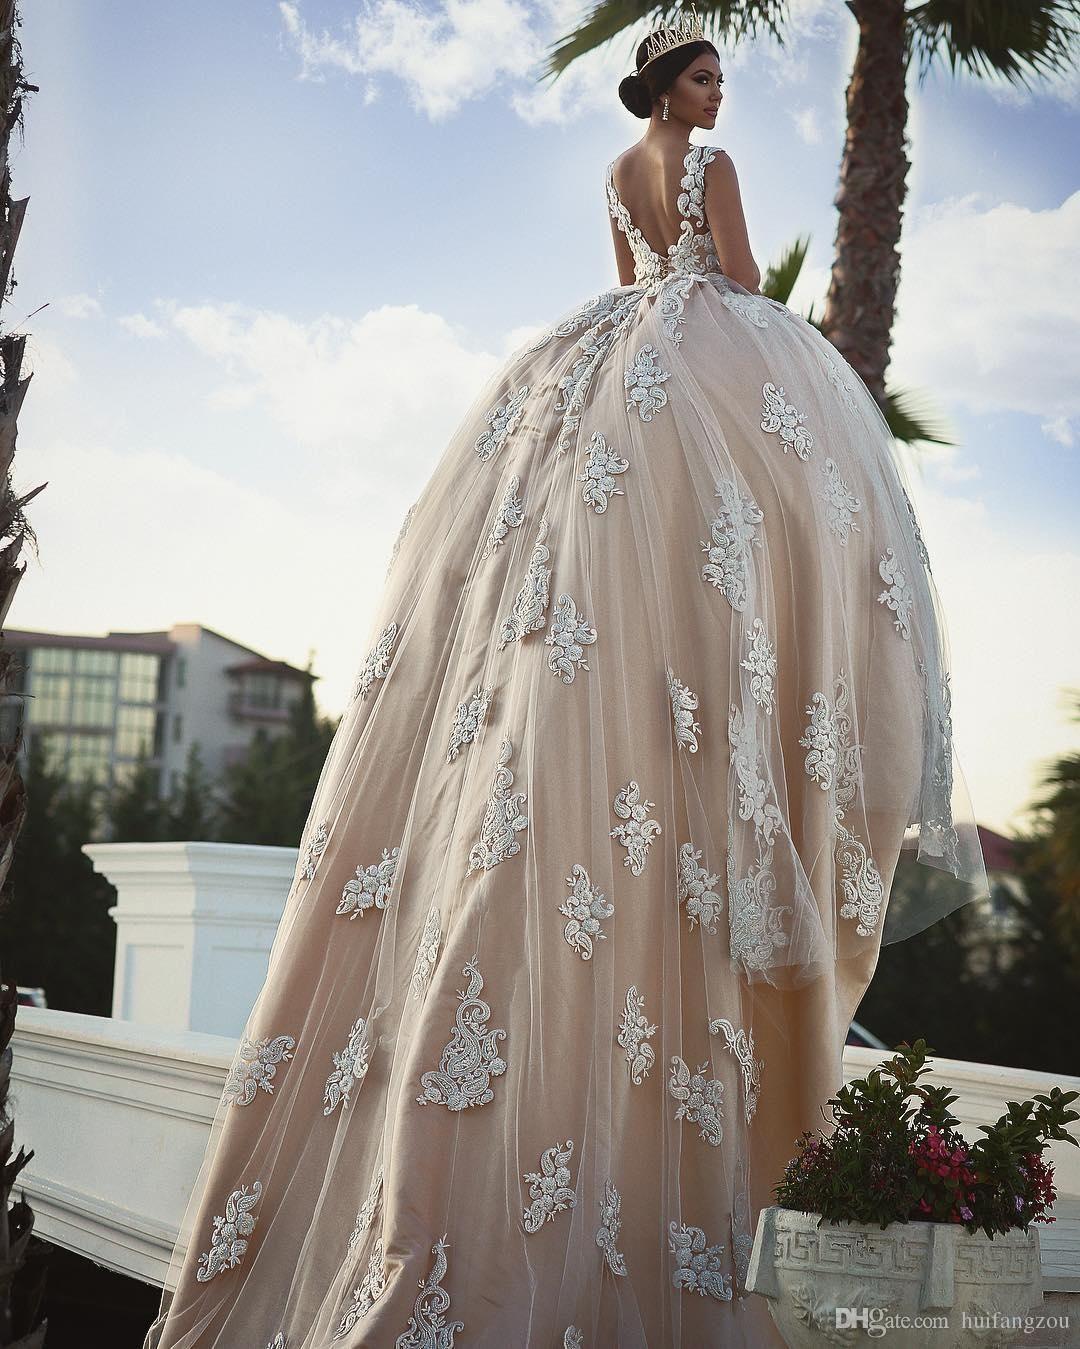 Cheap vintage lace ball gown wedding dresses delicate appliques